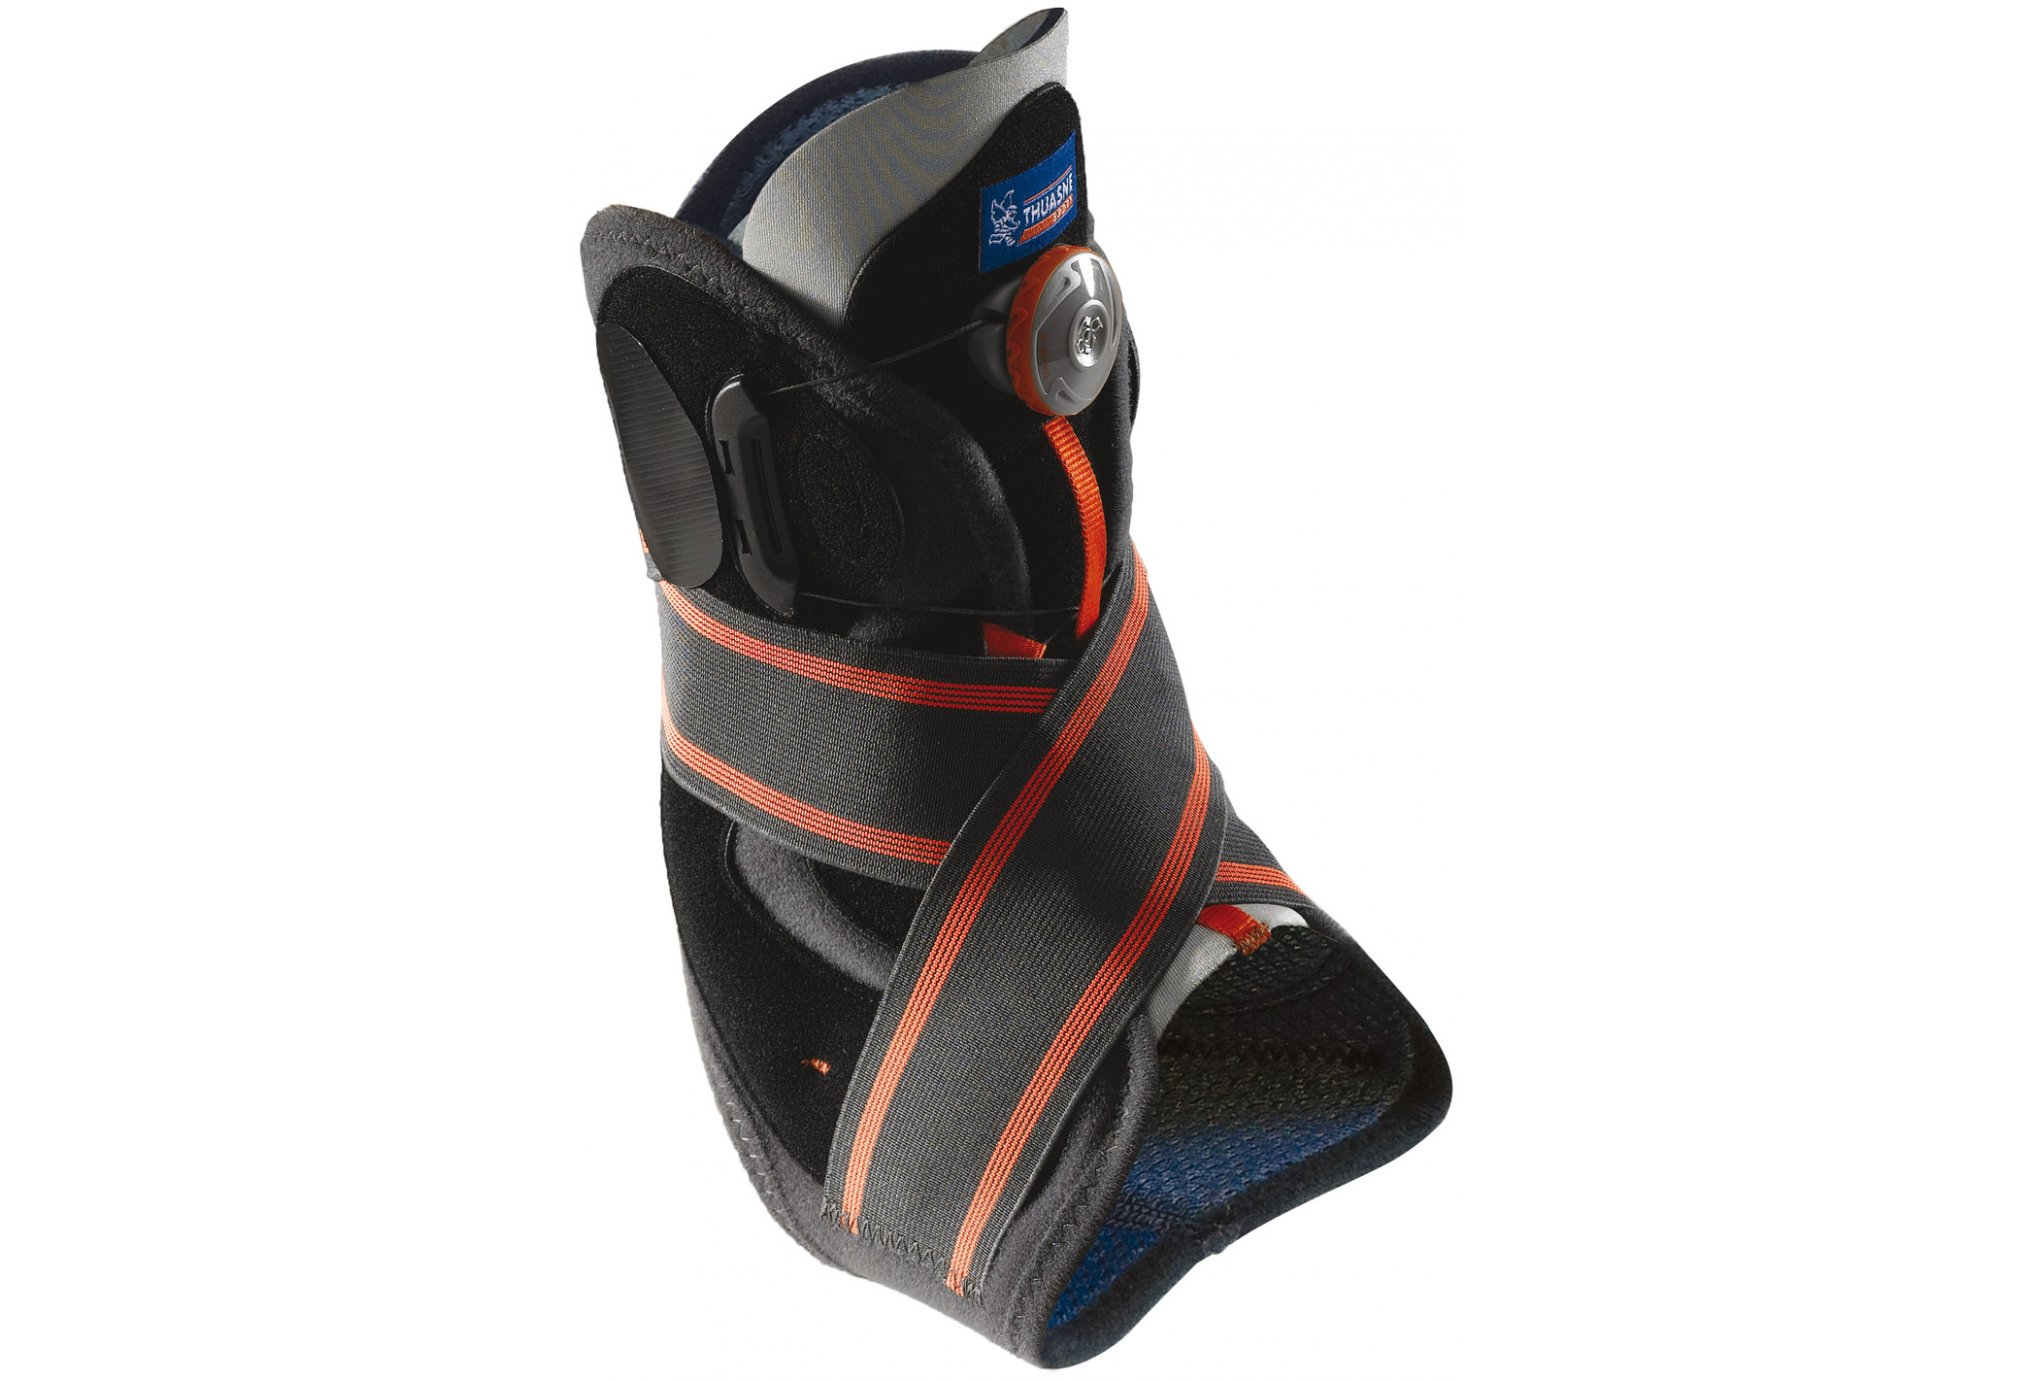 Chaussette Elite Run Nike De Compression OPk80wn